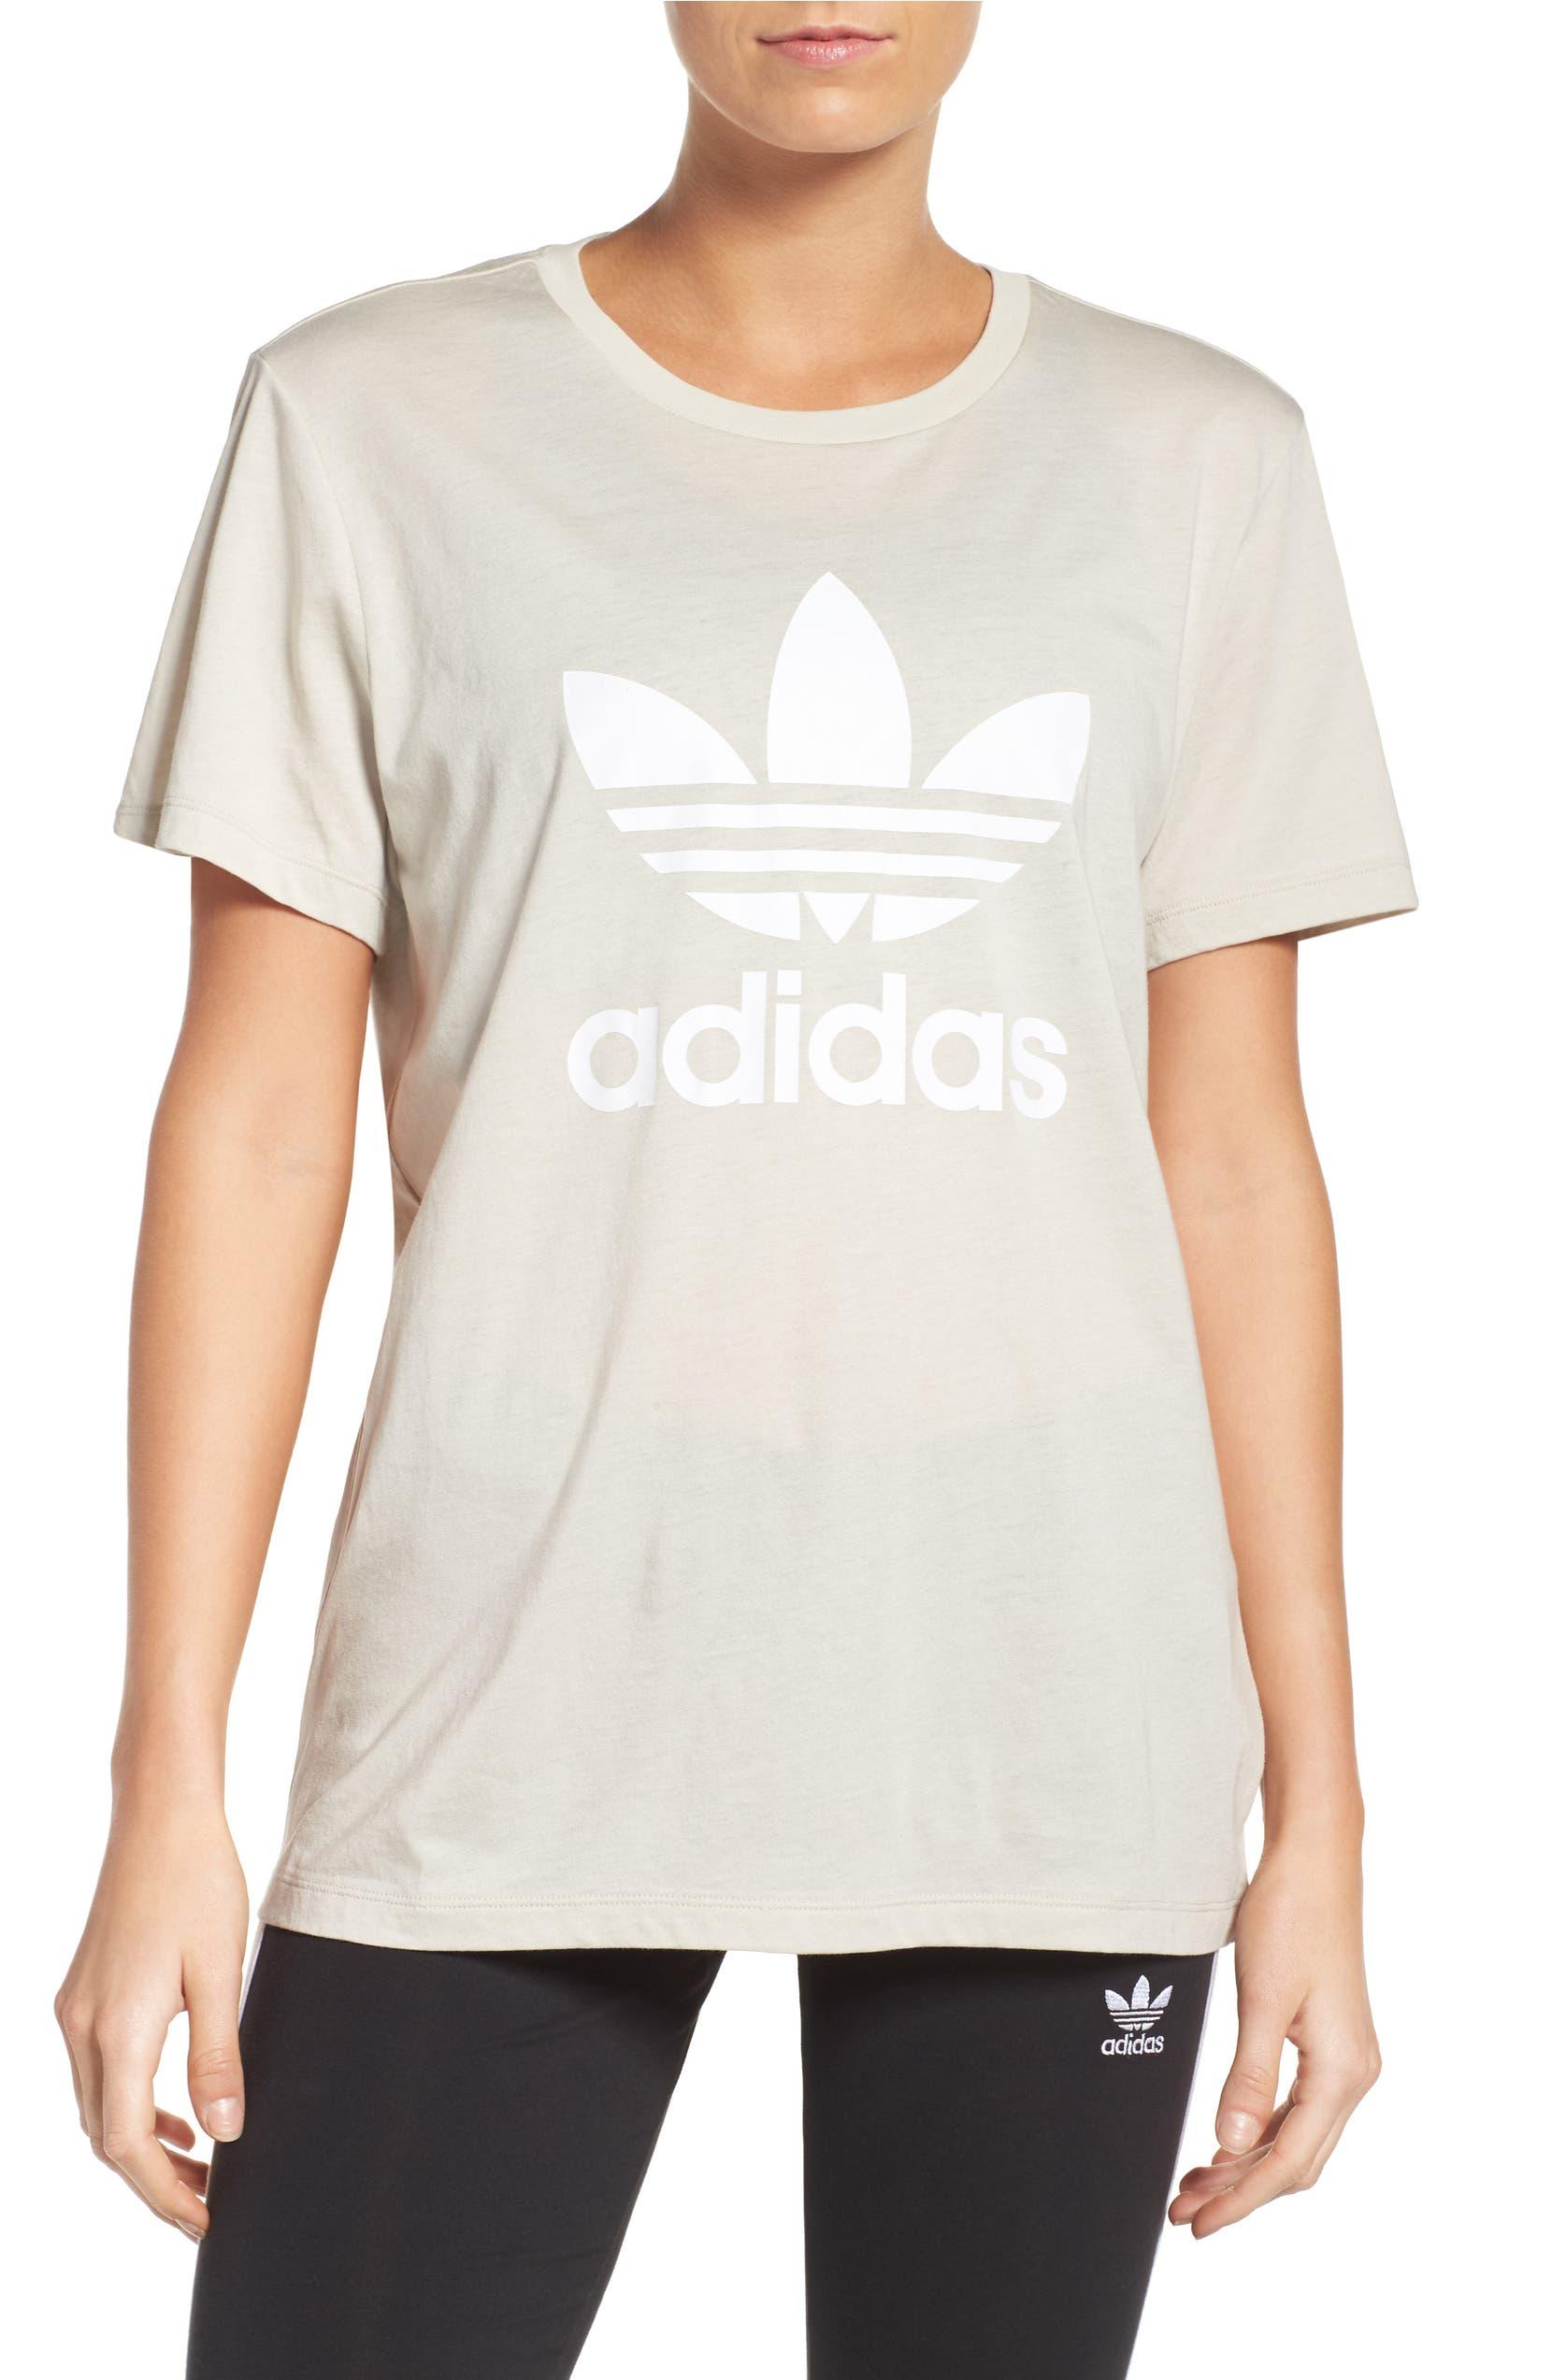 c9d5863c5b7 adidas Originals Boyfriend Tee | Nordstrom